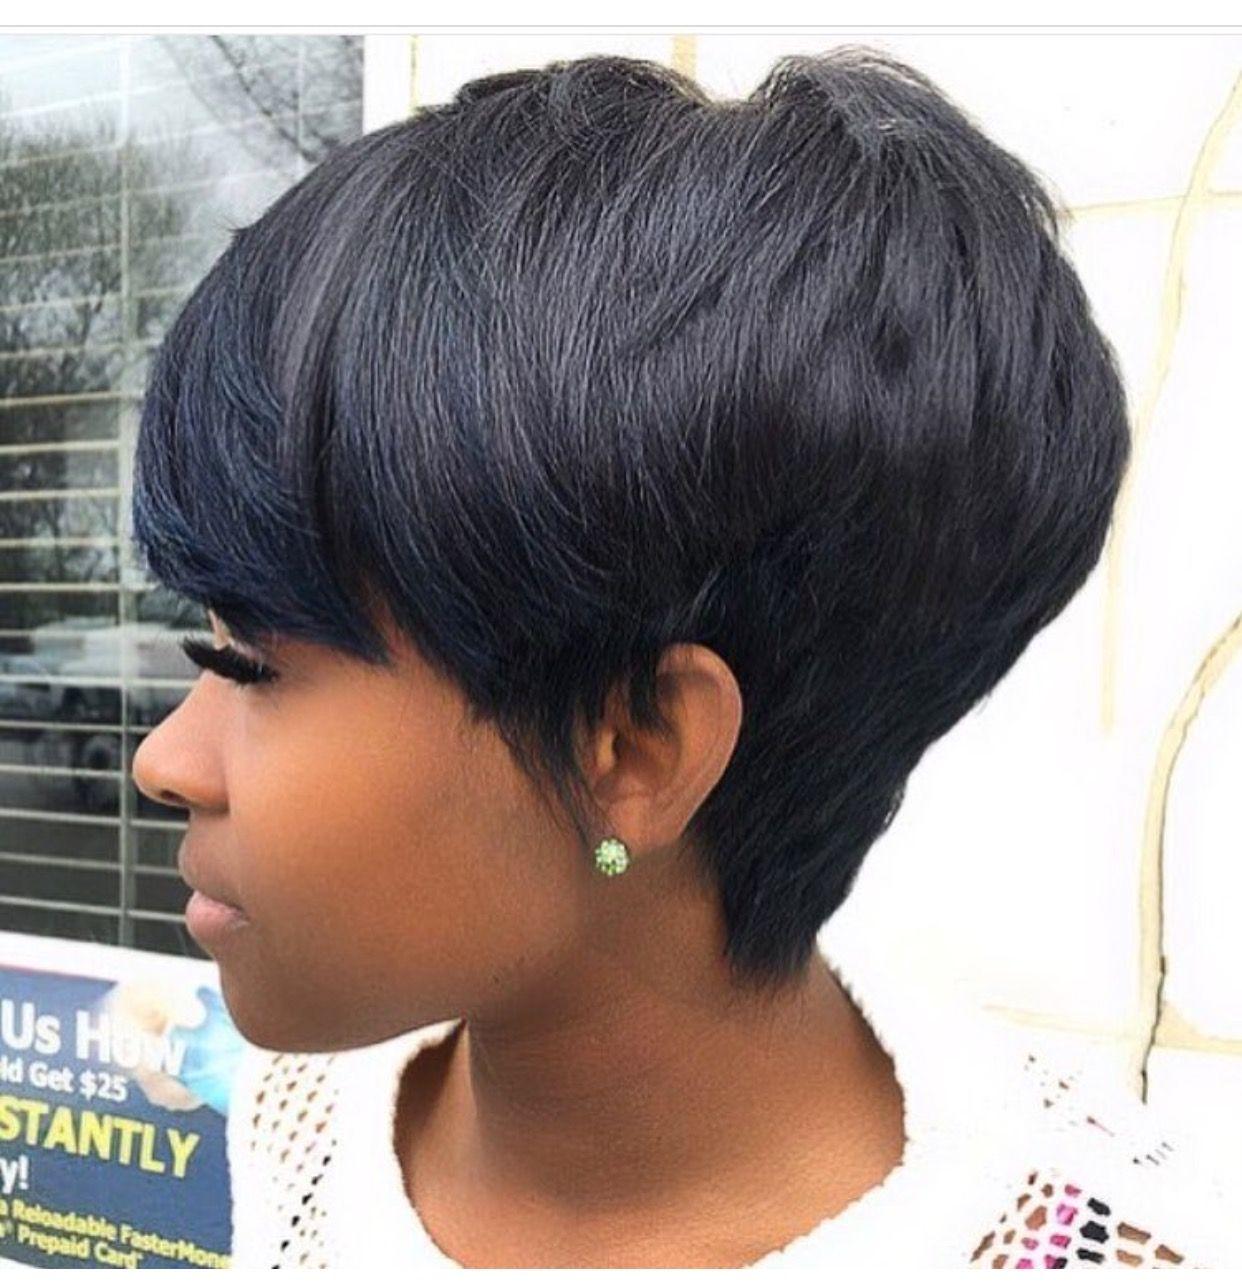 Pin by JordynCrimiel on Hair Pinterest Hair styles Short